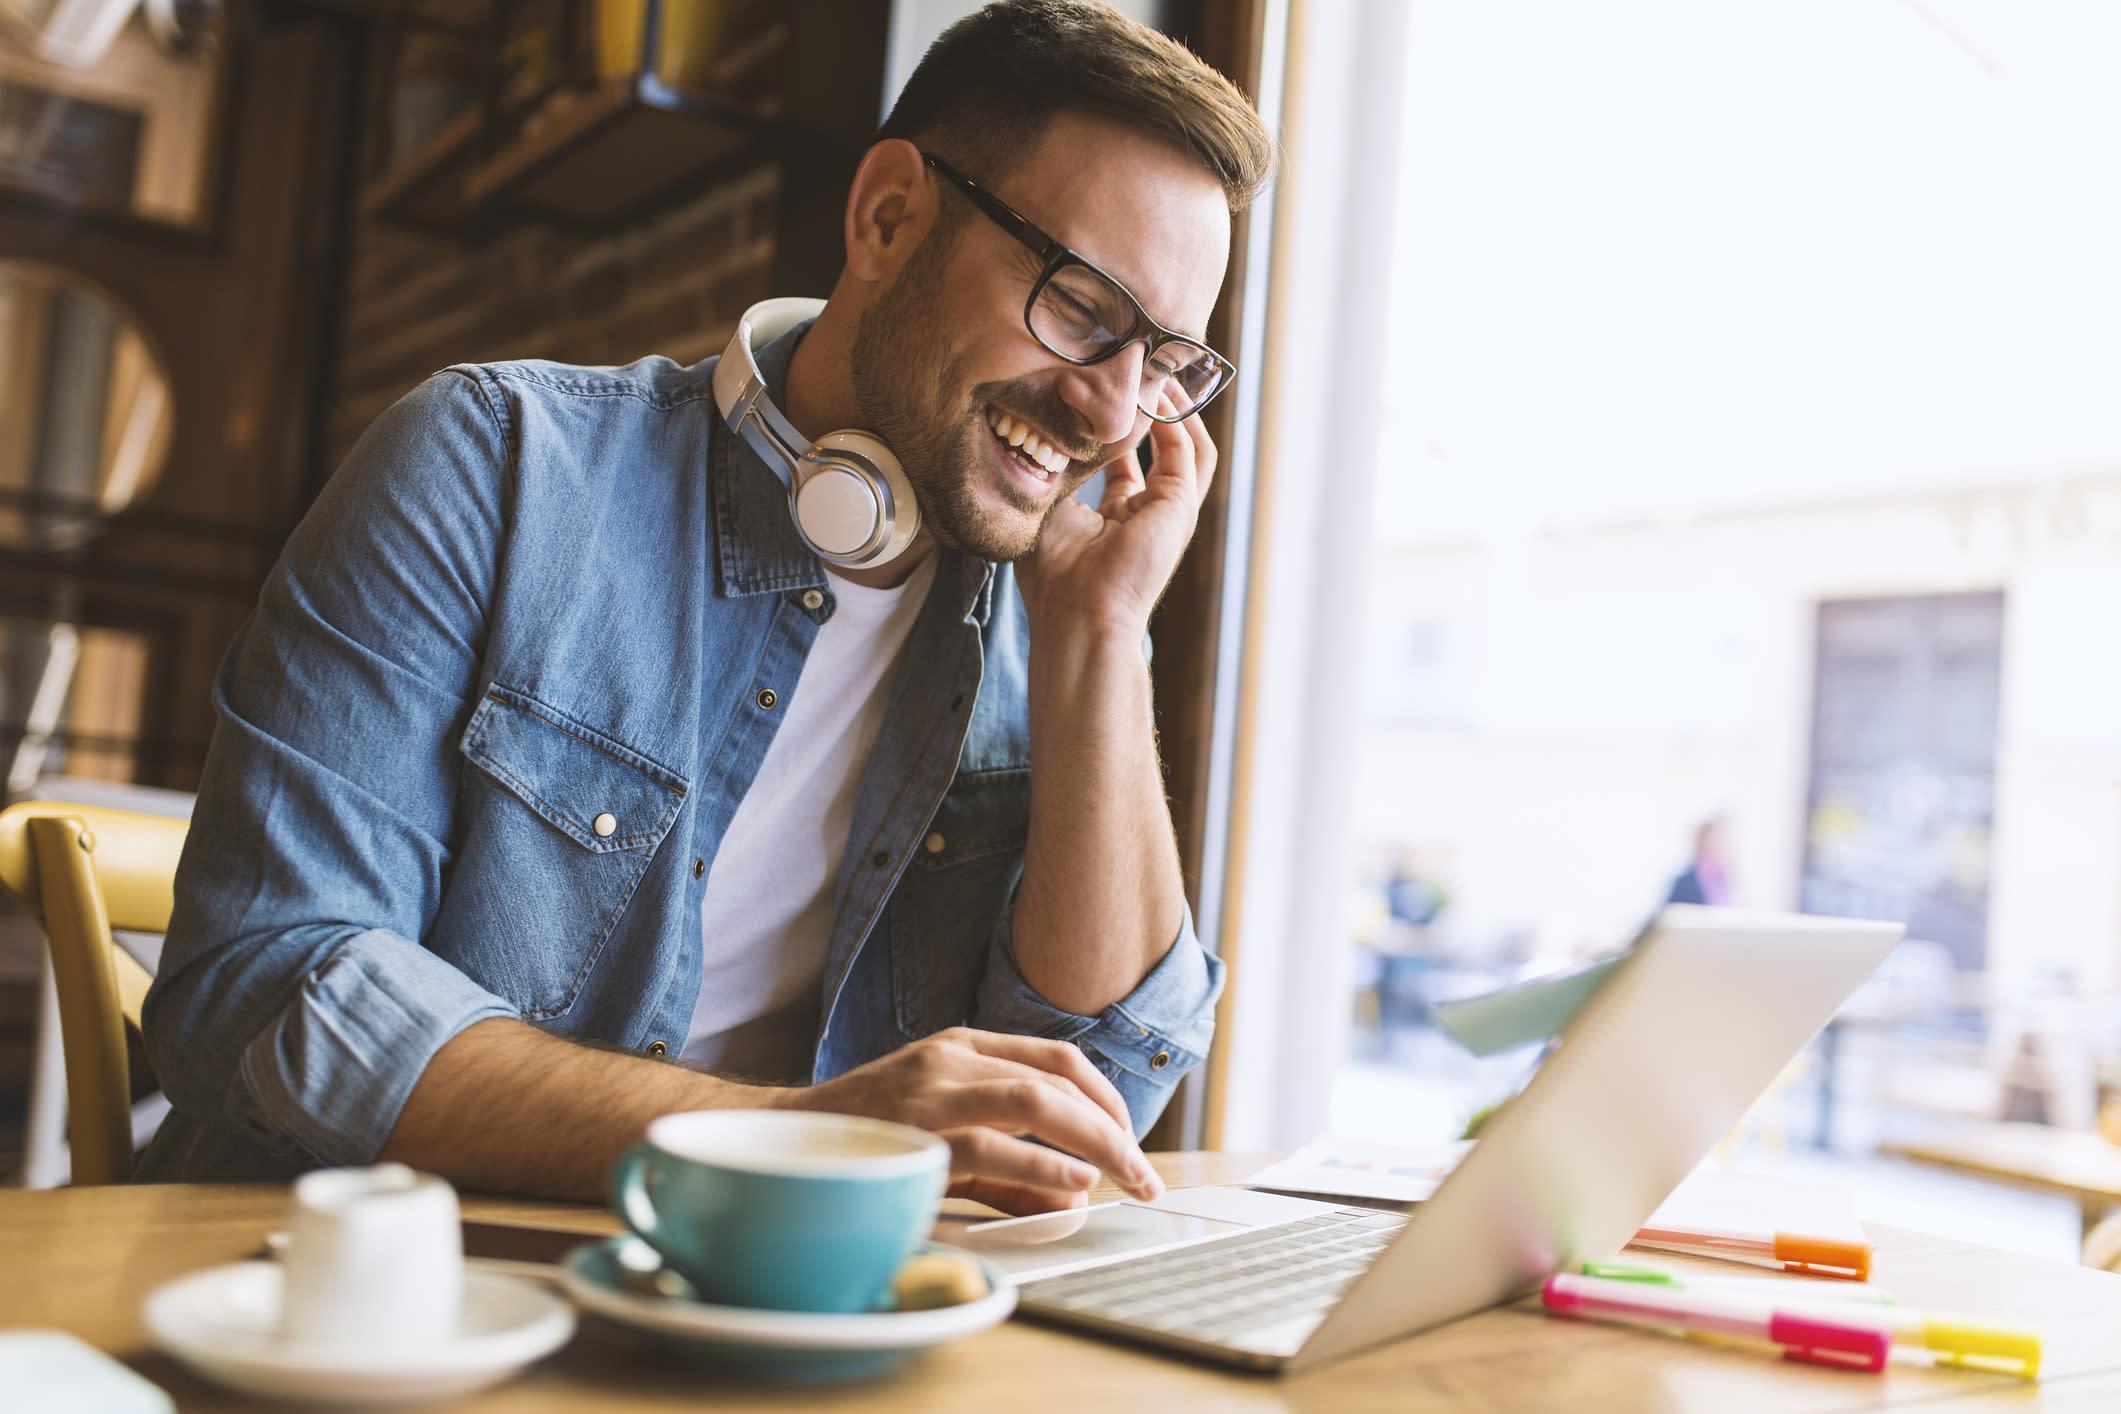 Taxes as a freelancer семантическое ядро фриланс